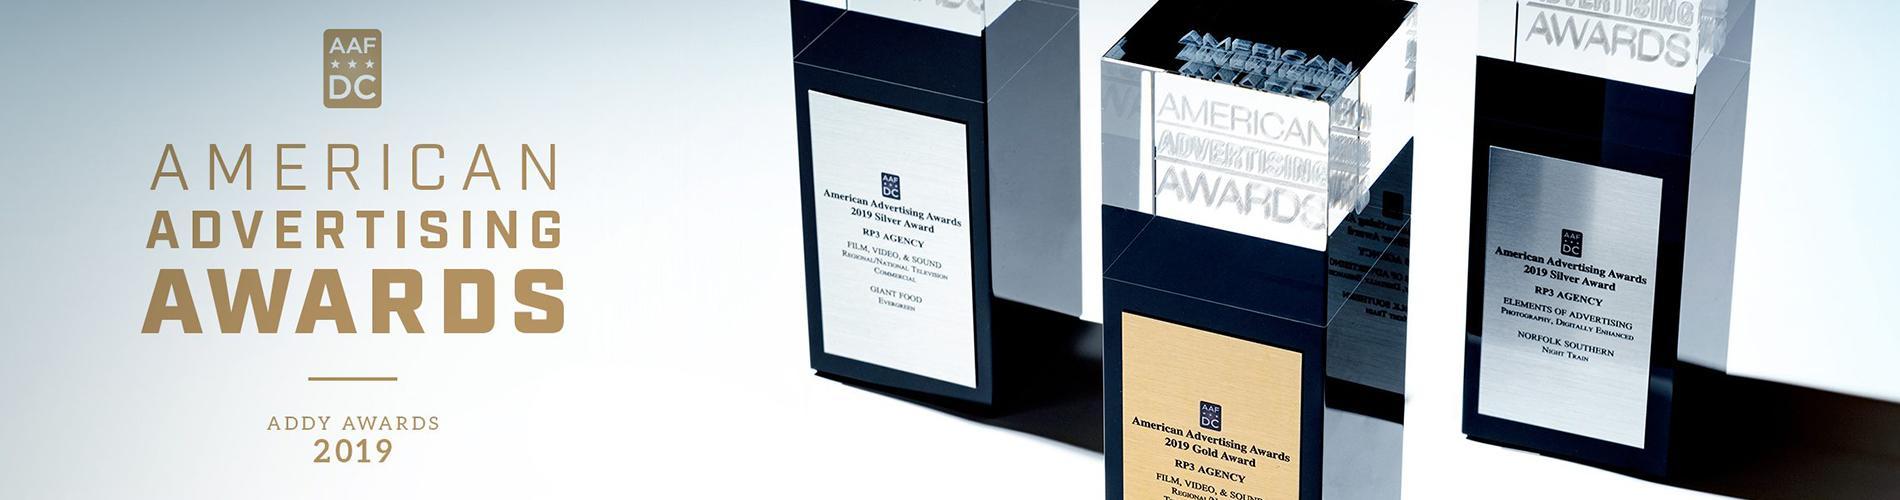 Three Wins at 2019 American Advertising Awards DC